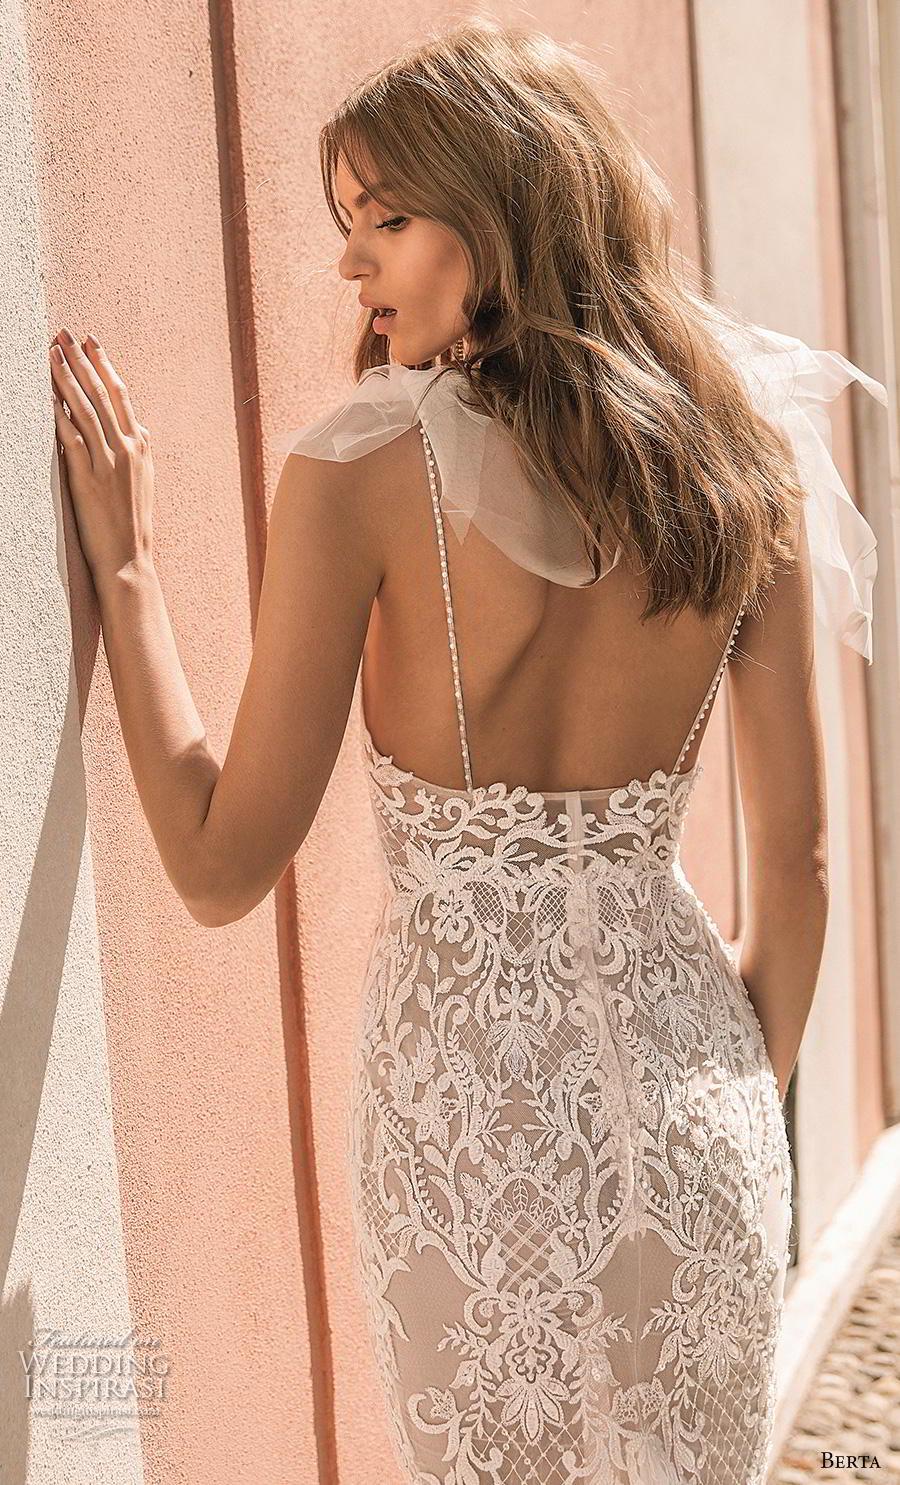 berta 2019 privee bridal thin strap diamond neck full embellishment elegant glamorous sheath wedding dress backless chapel train (5) zbv